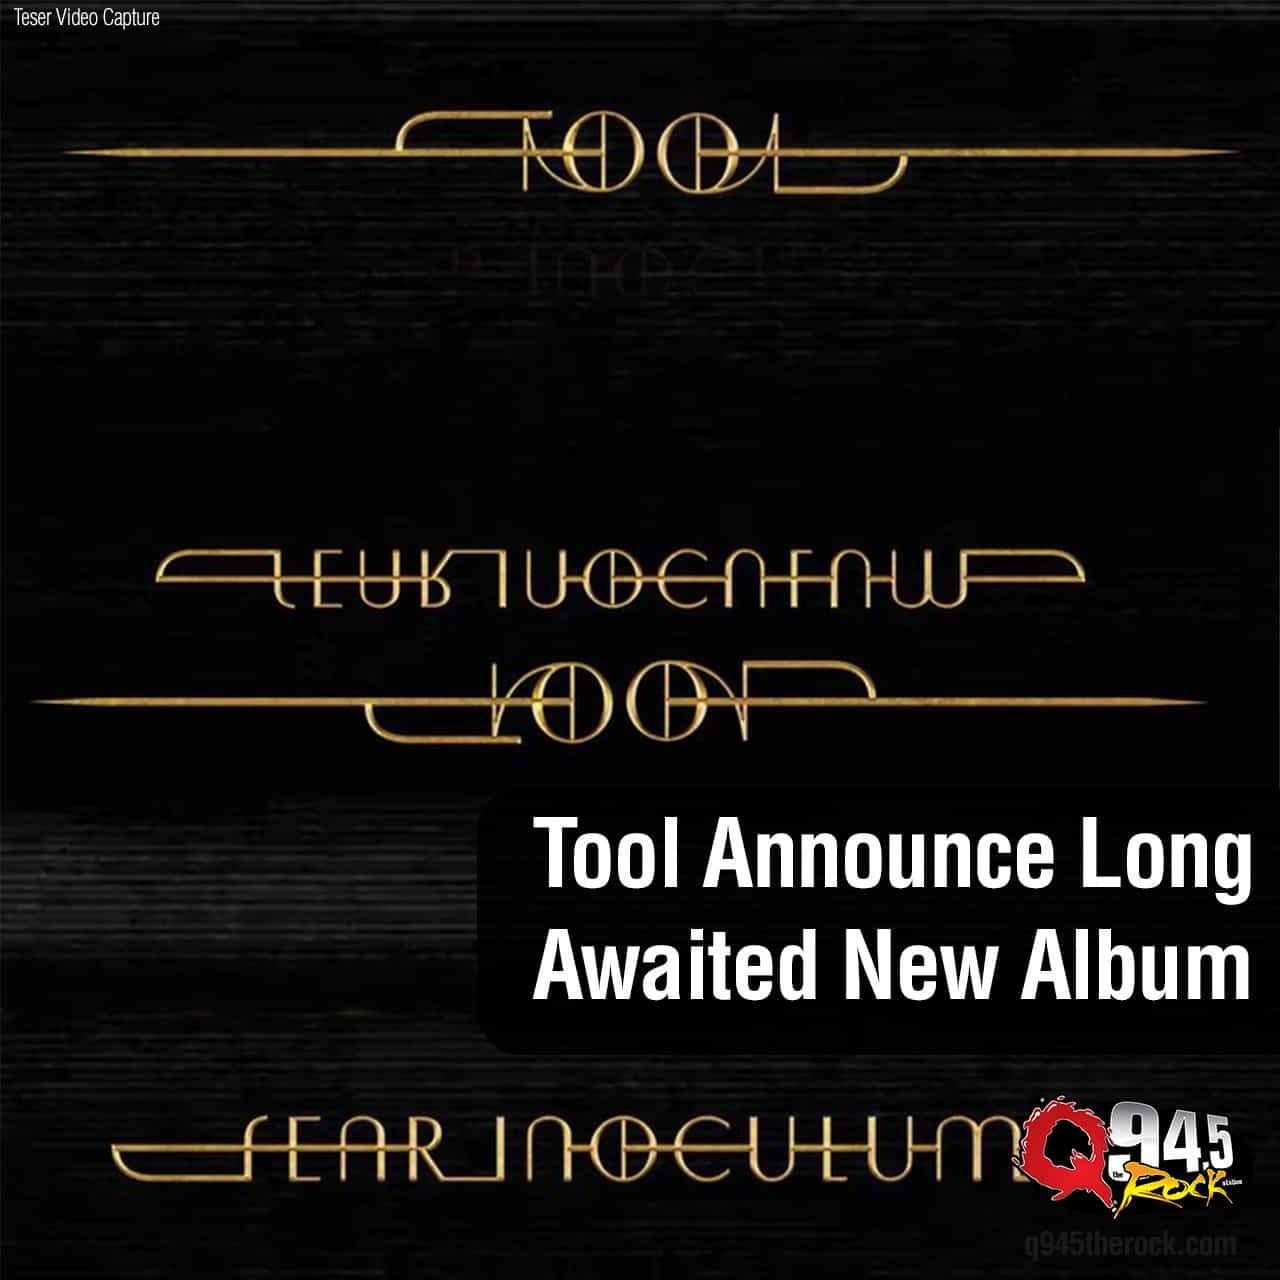 Tool Announce Long Awaited New Album